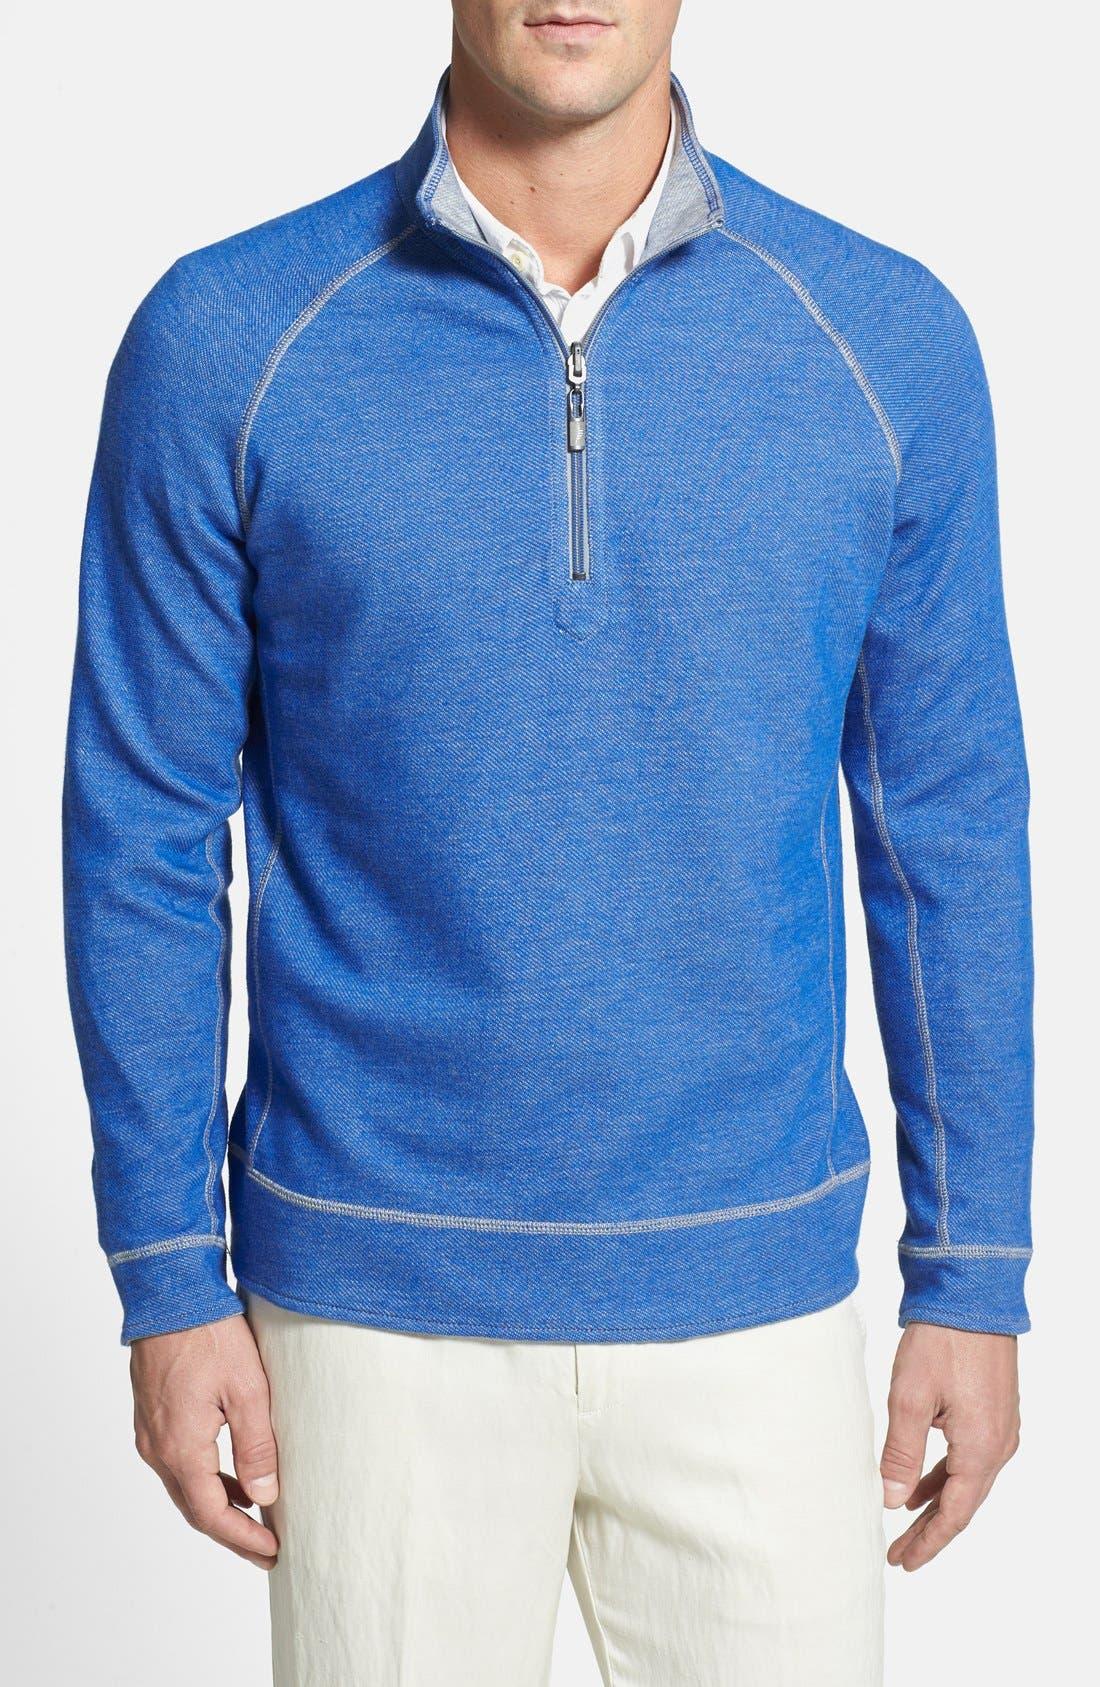 Alternate Image 1 Selected - Tommy Bahama Denim 'Bob Twillin' Island Modern Fit Reversible Half Zip Sweatshirt